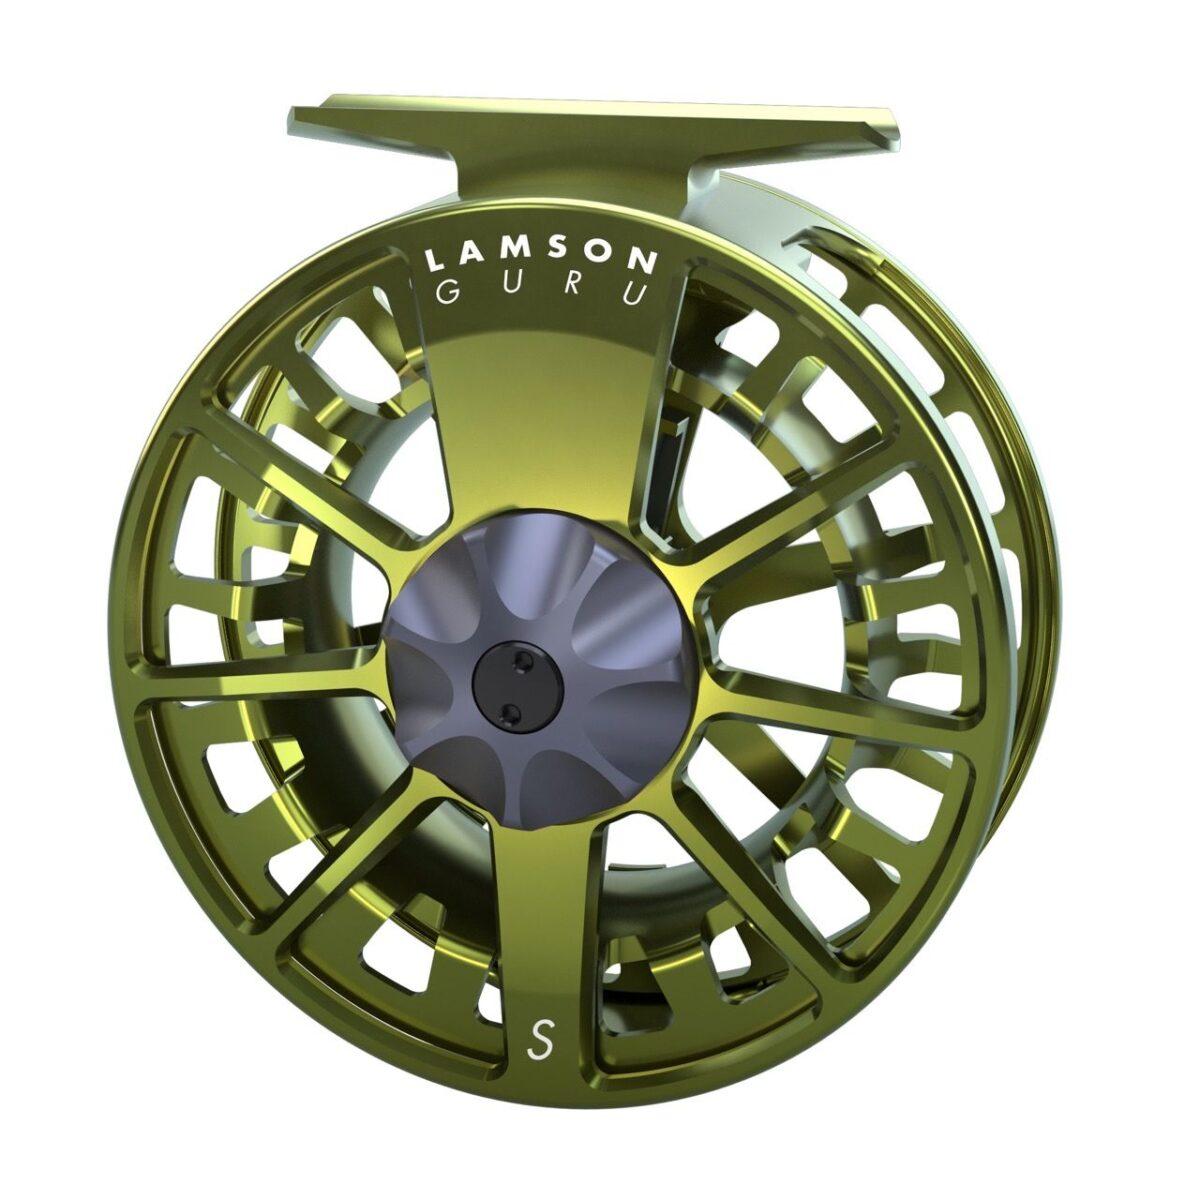 Carrete Lamson Guru Olive S Fly Reel 2020